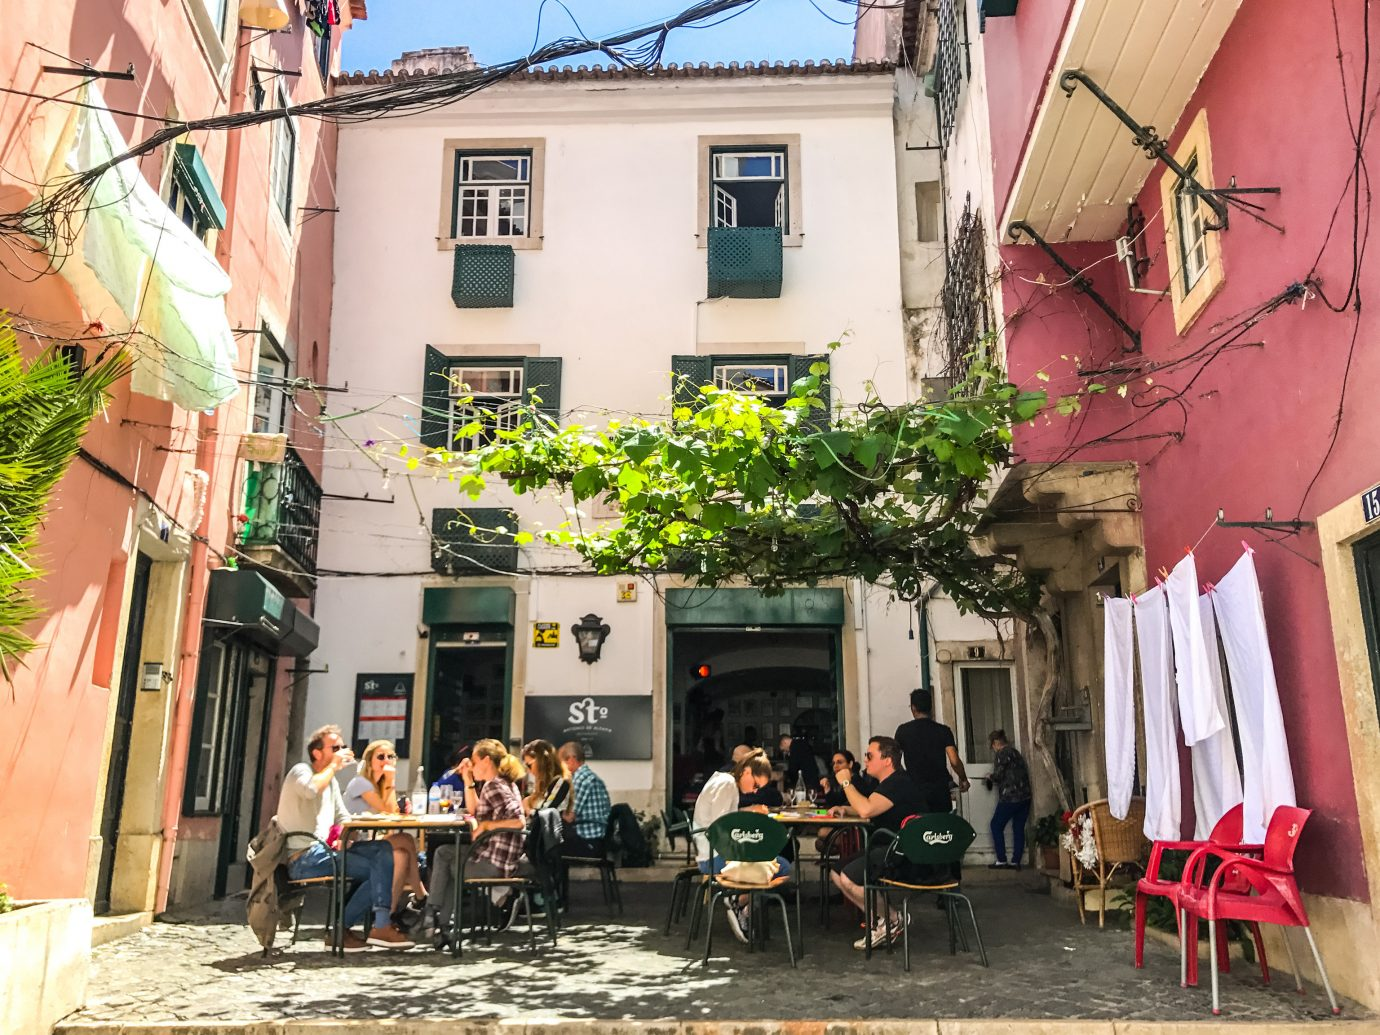 Lisbon Portugal Trip Ideas neighbourhood Town street house road City facade alley window tourism tree Balcony